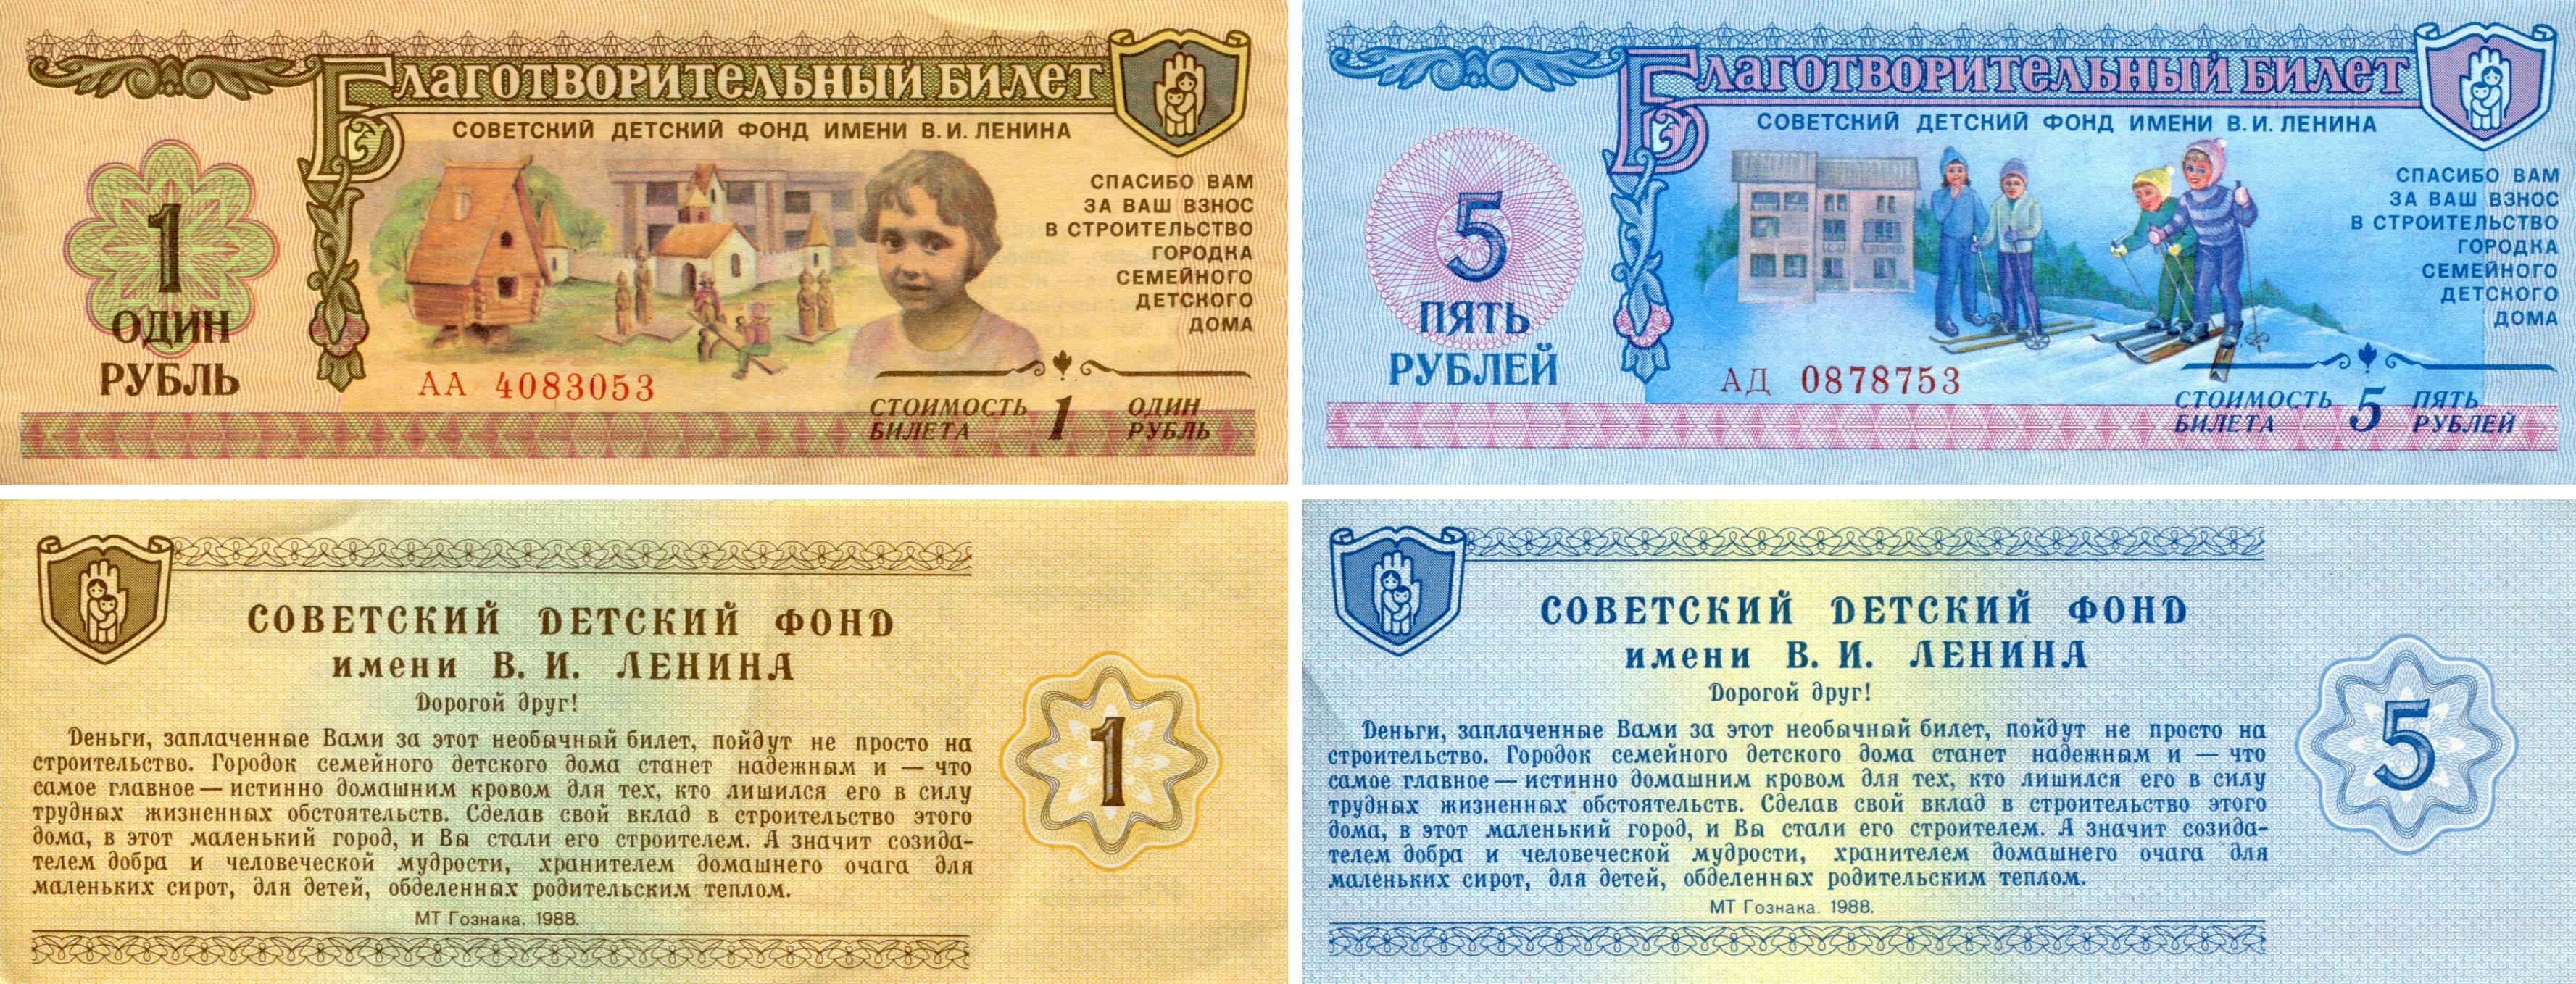 50 100 200 Million Zimbabwe Dollars x 5 Bank Notes Each ~ AA 2008 Almost UNC